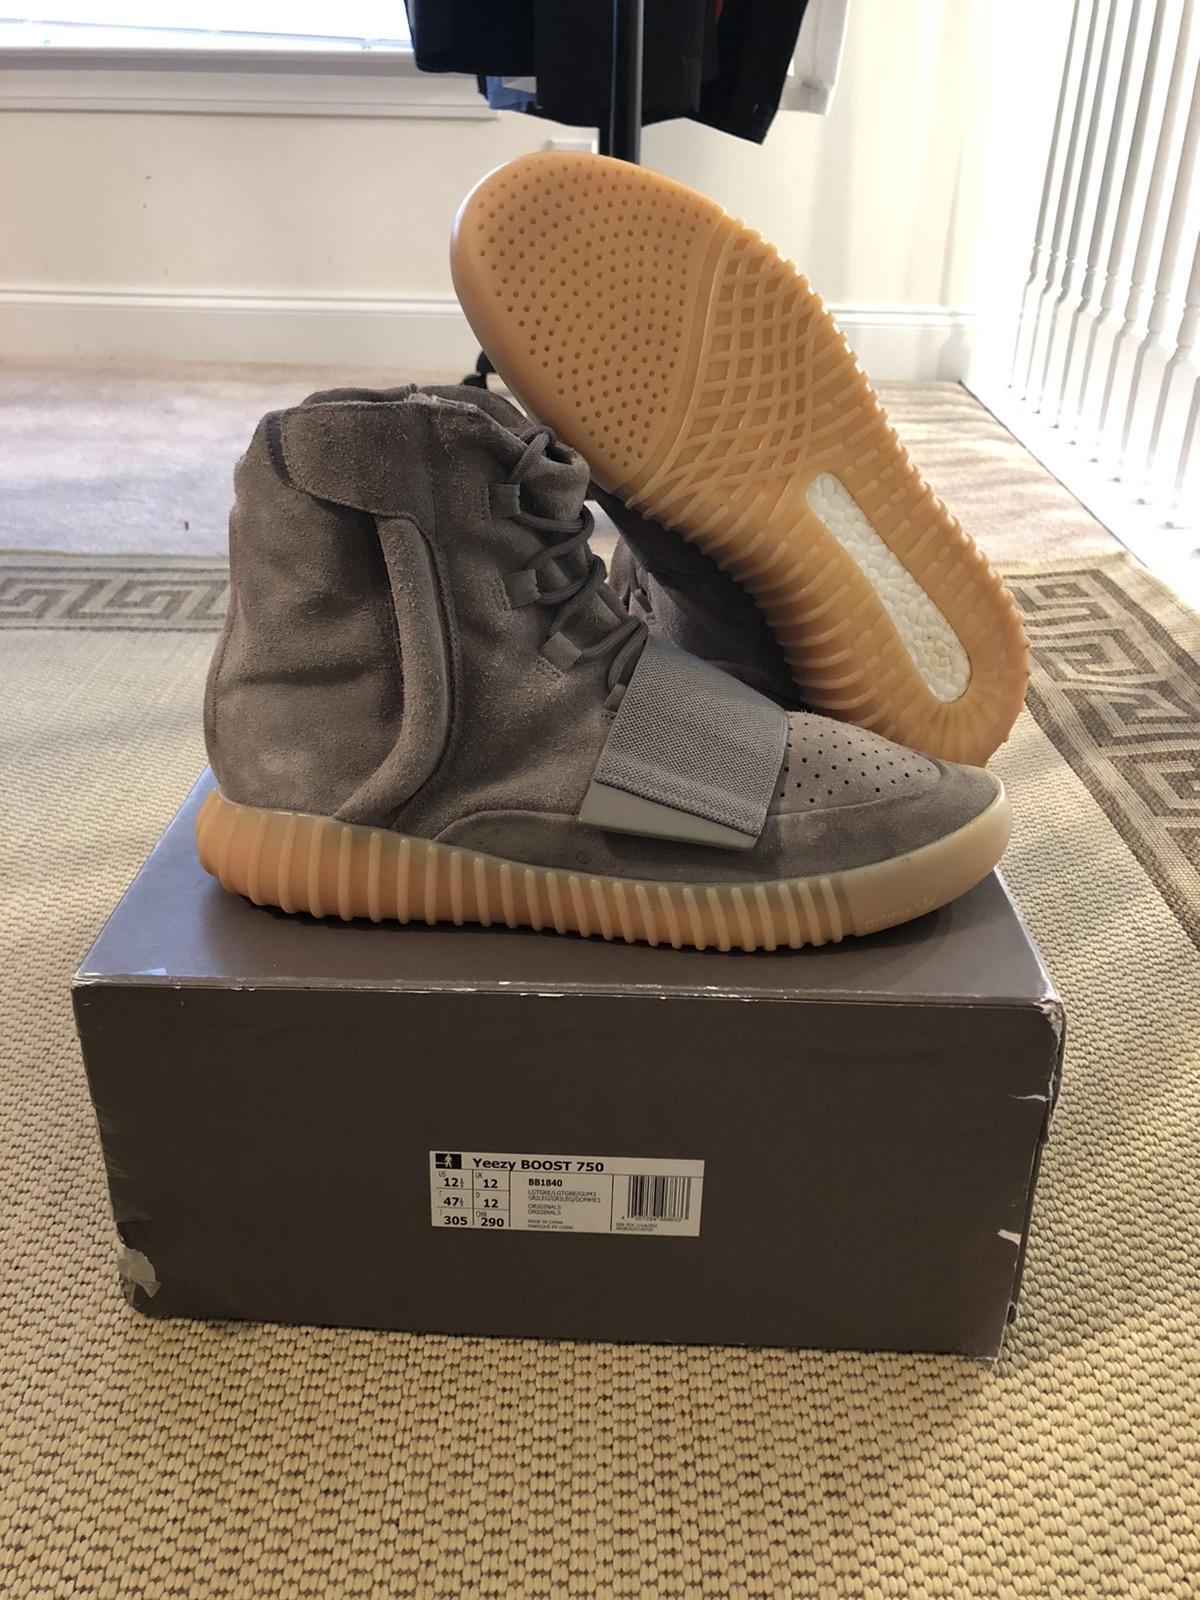 Facebook 2 Adidas Yeezy Boost 750 Grey Gum Size Eu 45